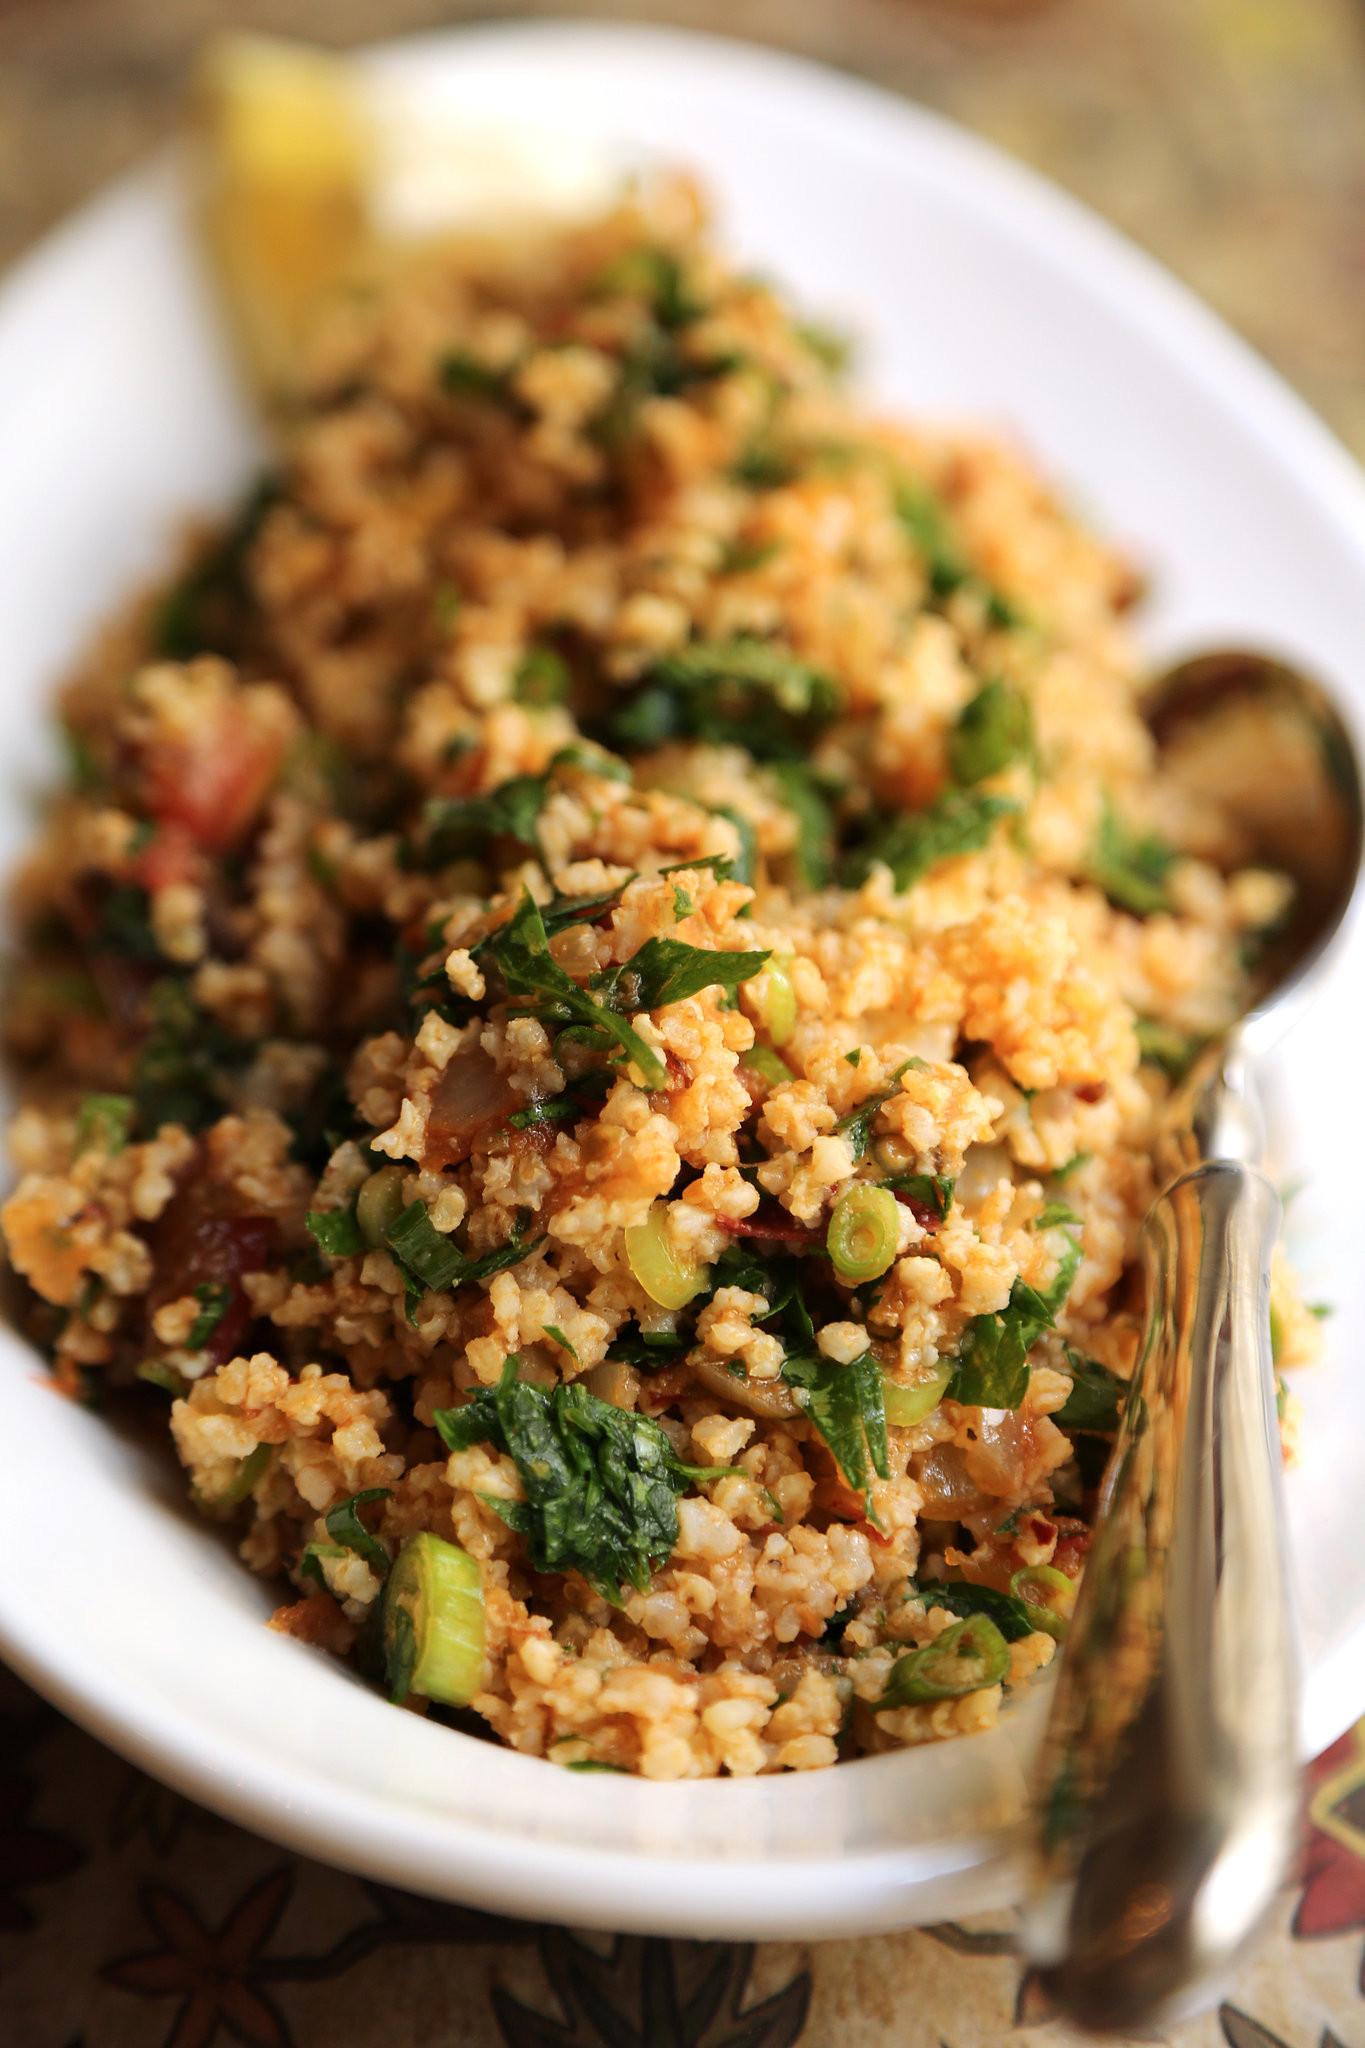 Healthy Quinoa Recipes  Fast Easy Healthy Recipe For Quinoa Tabbouleh